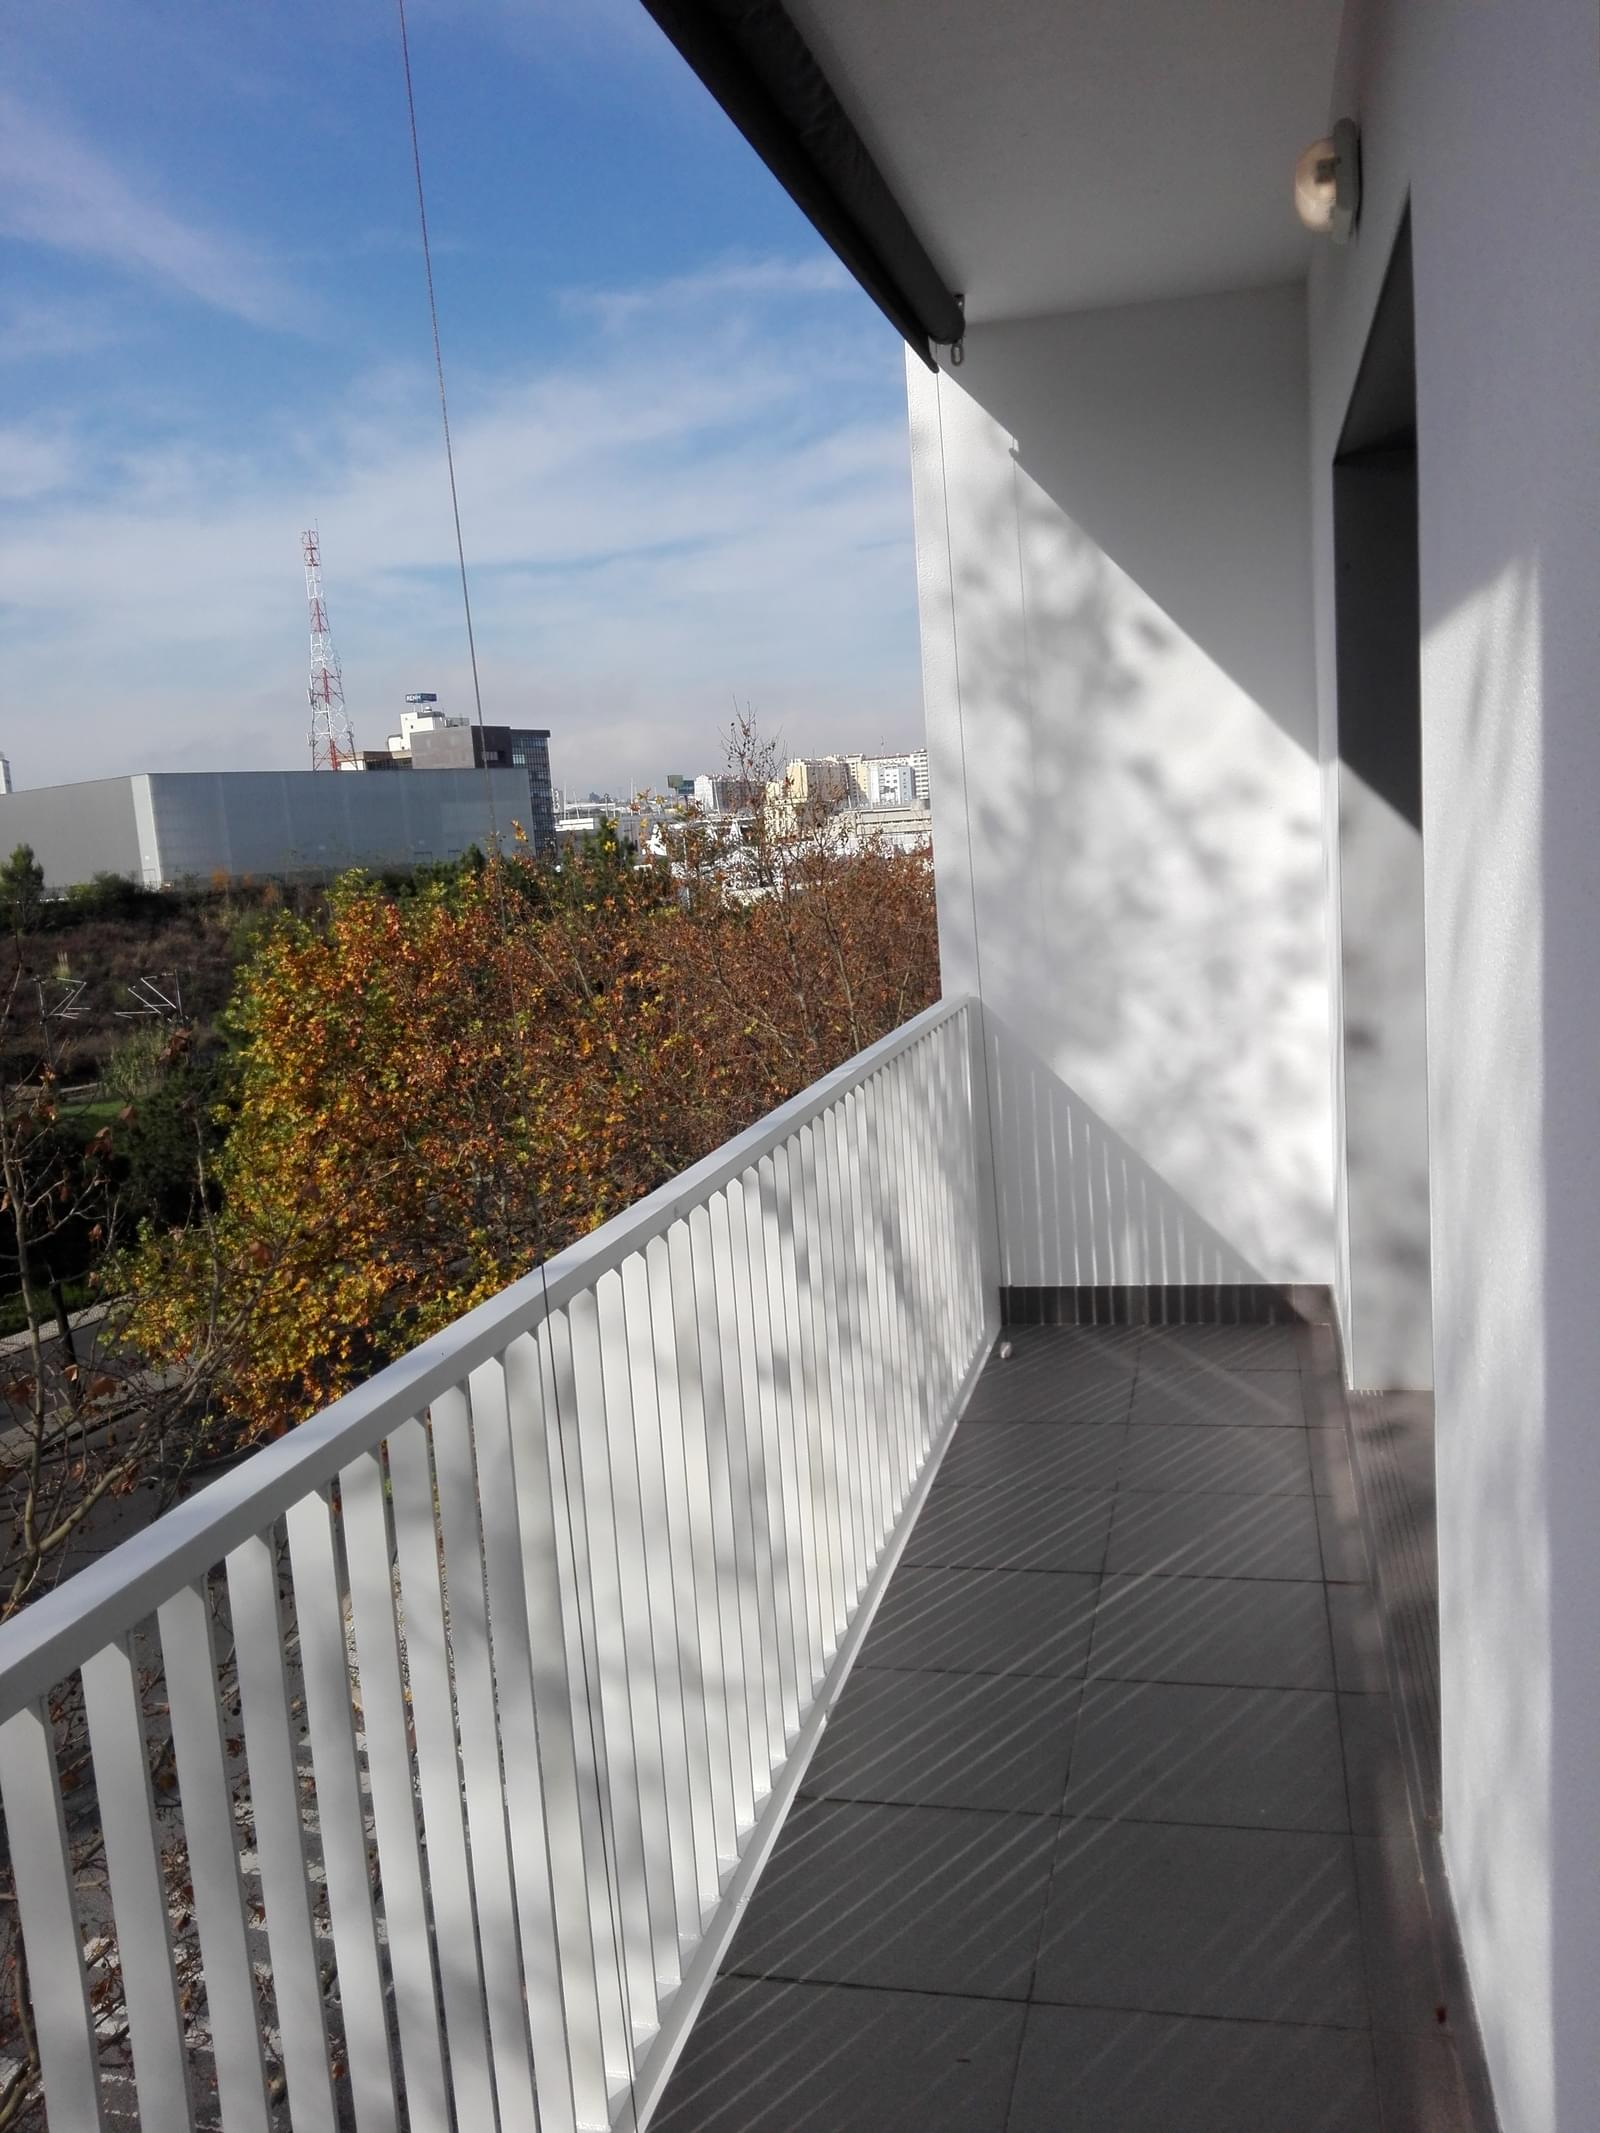 pf18814-apartamento-t2-lisboa-a8c80120-cfa1-4ee0-bf88-676e67744666